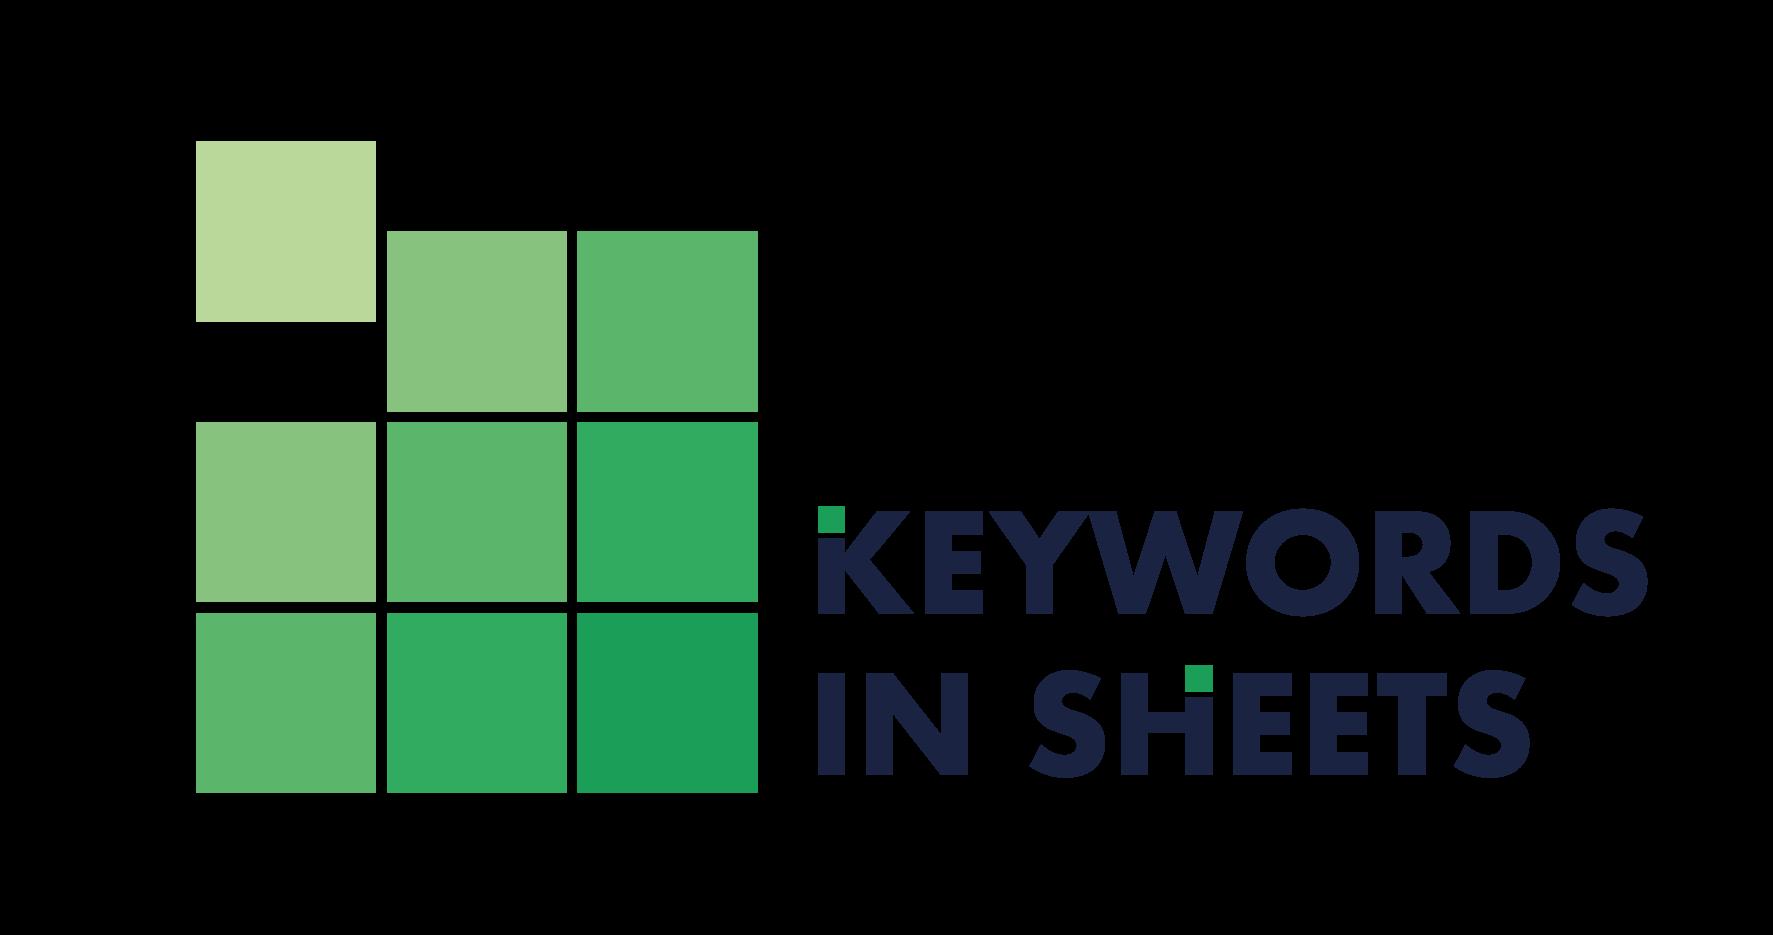 Keywords in Sheets